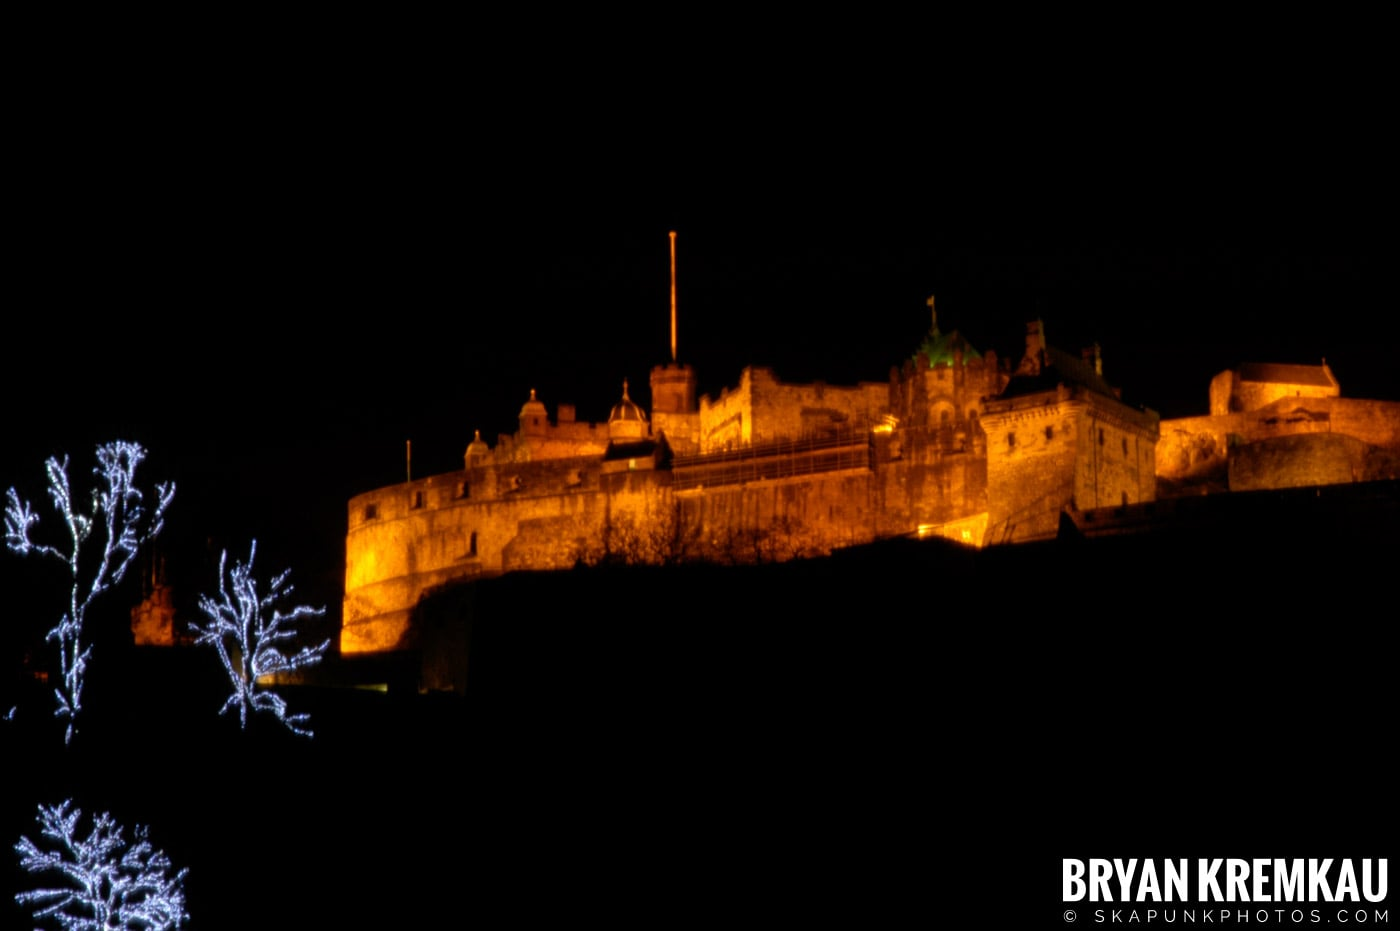 Edinburgh, Scotland - Day 1 - 12.12.06 (8)